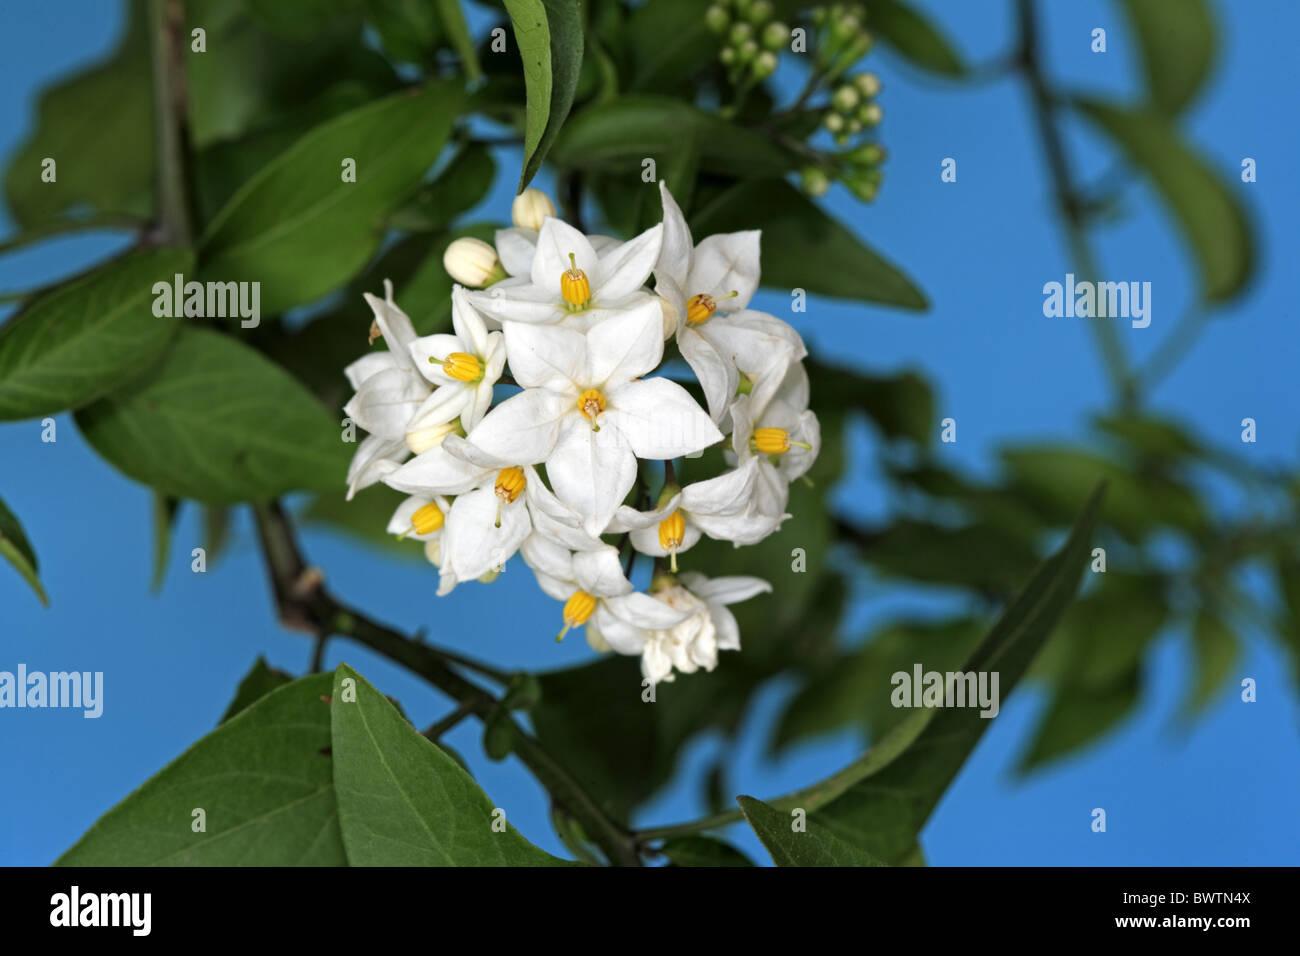 bluete bloom plant plants nightshade nightshades potato. Black Bedroom Furniture Sets. Home Design Ideas